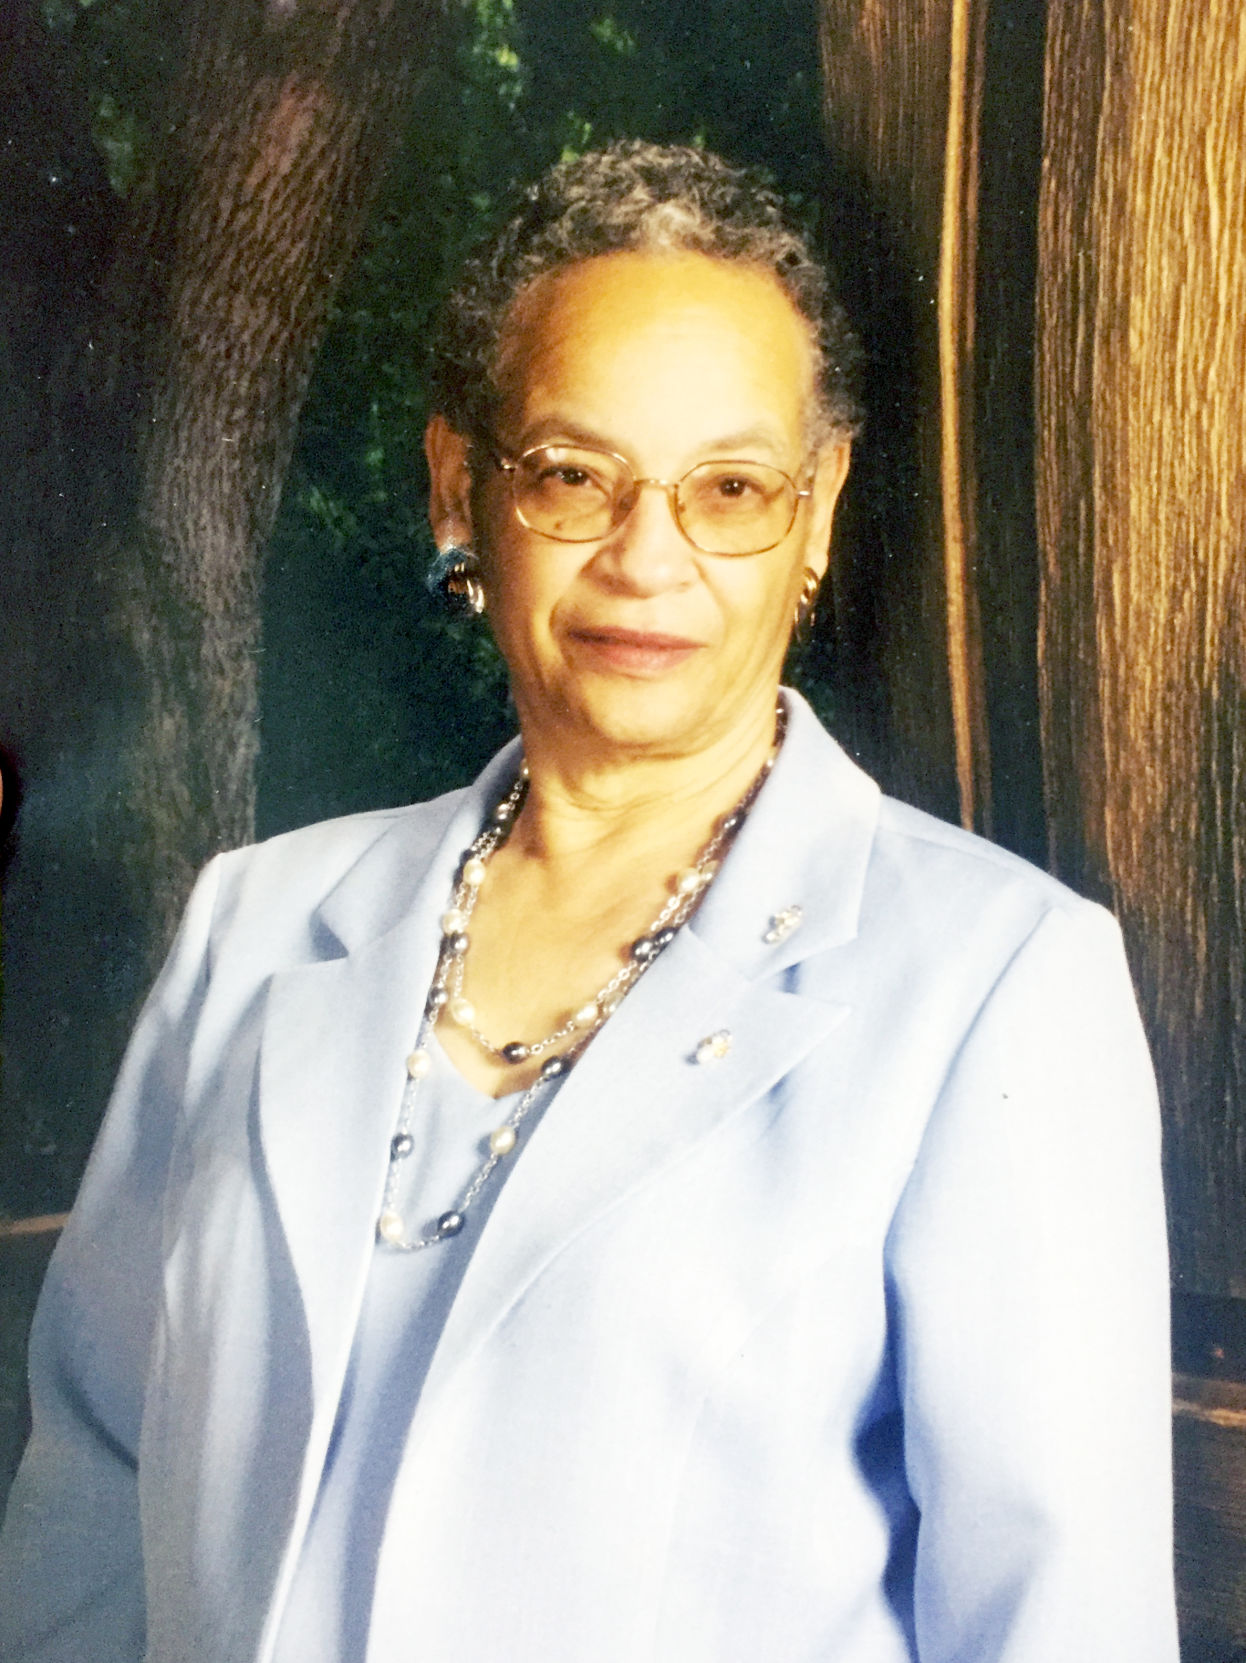 Valrie Chavis Brown